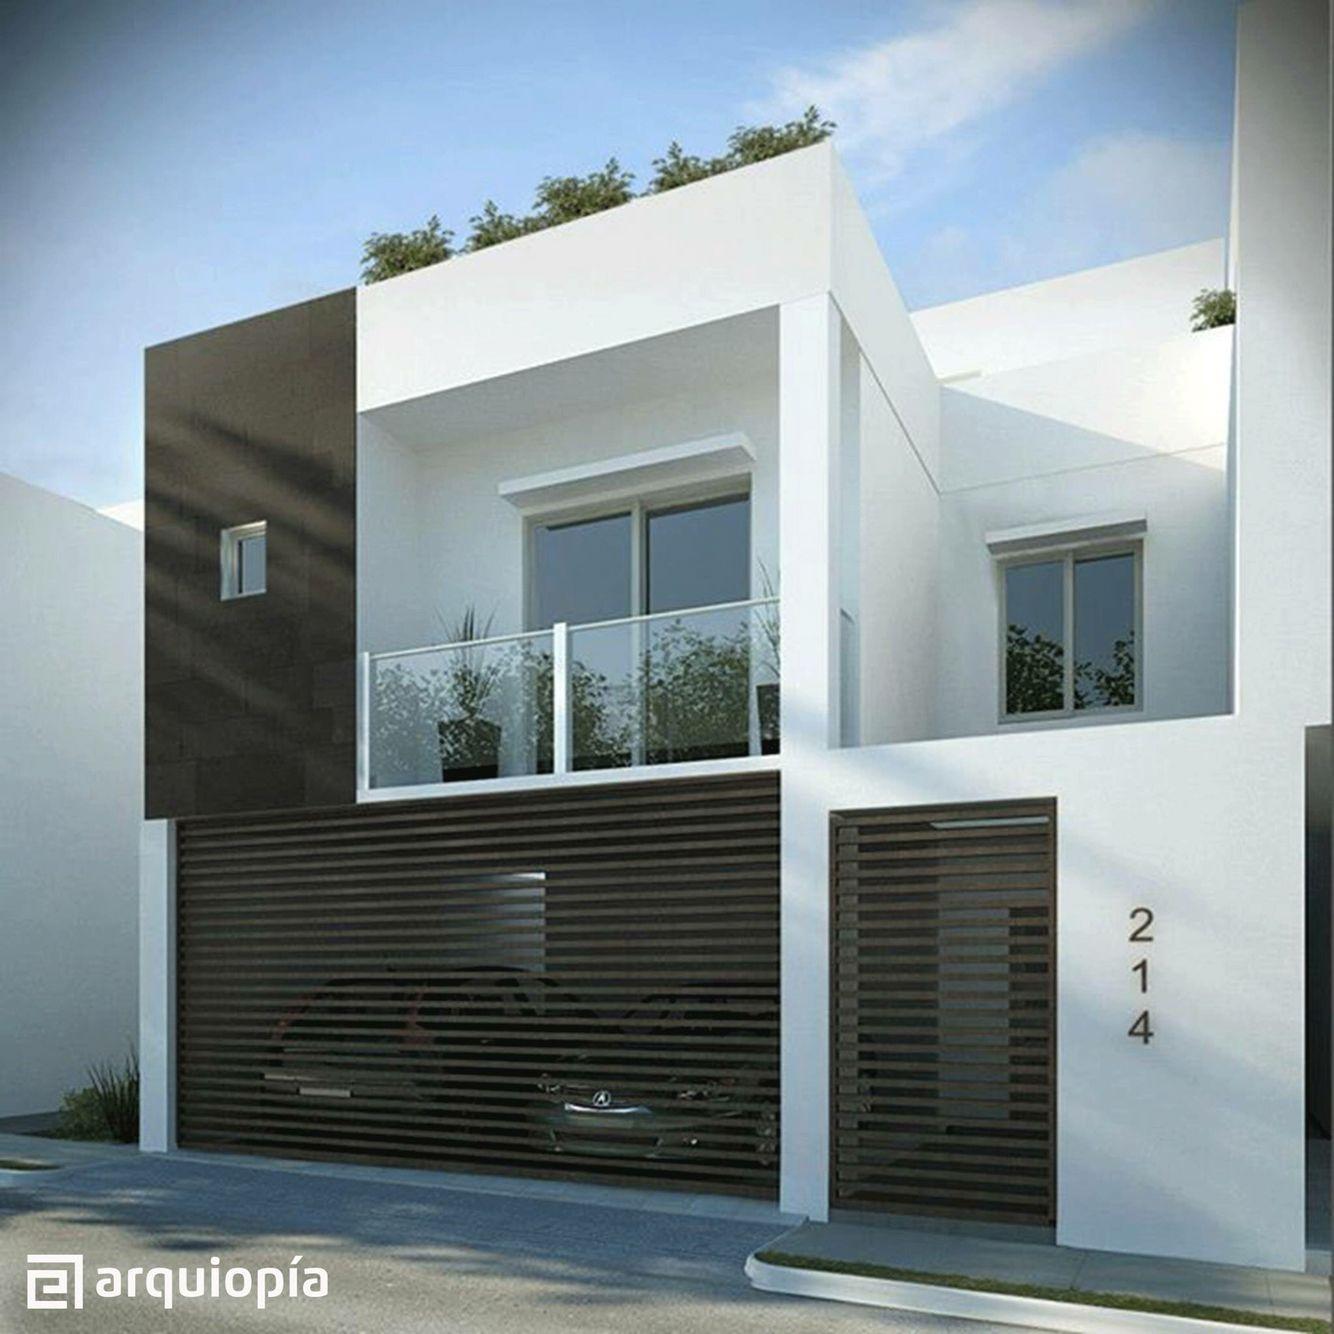 Casa 1 home style pinterest fachadas porton garage for Casas residenciales minimalistas